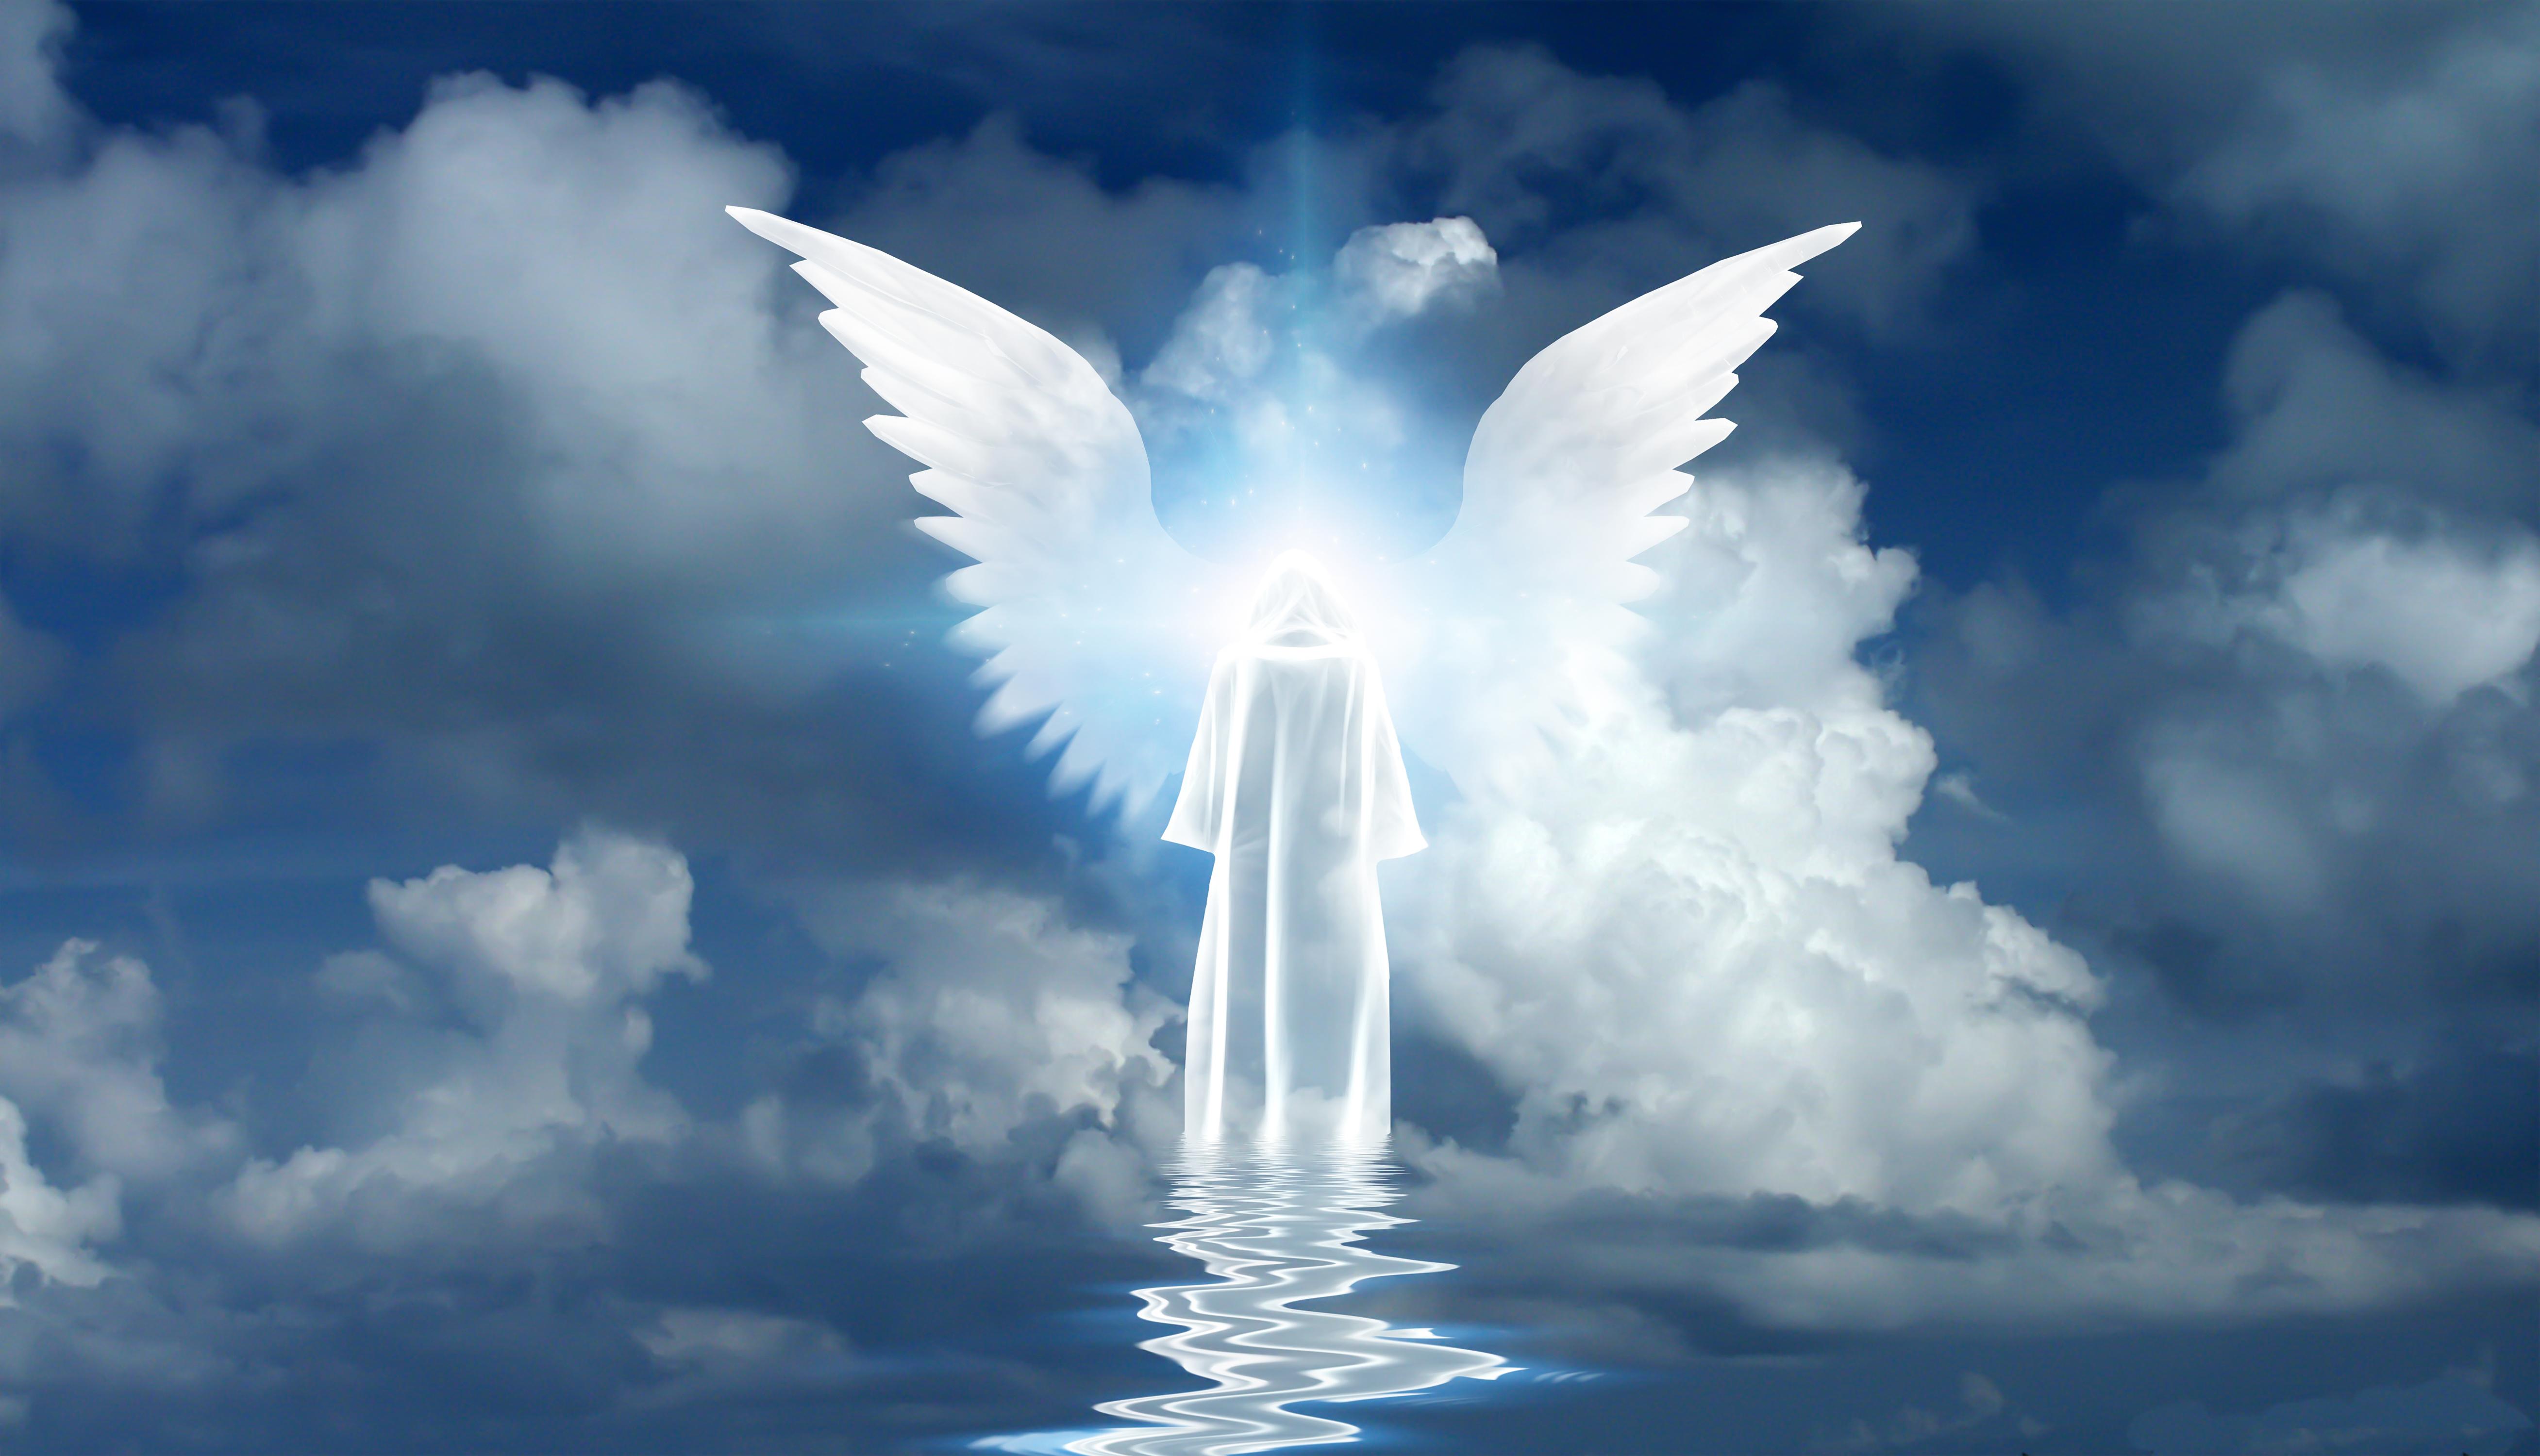 Angel's star